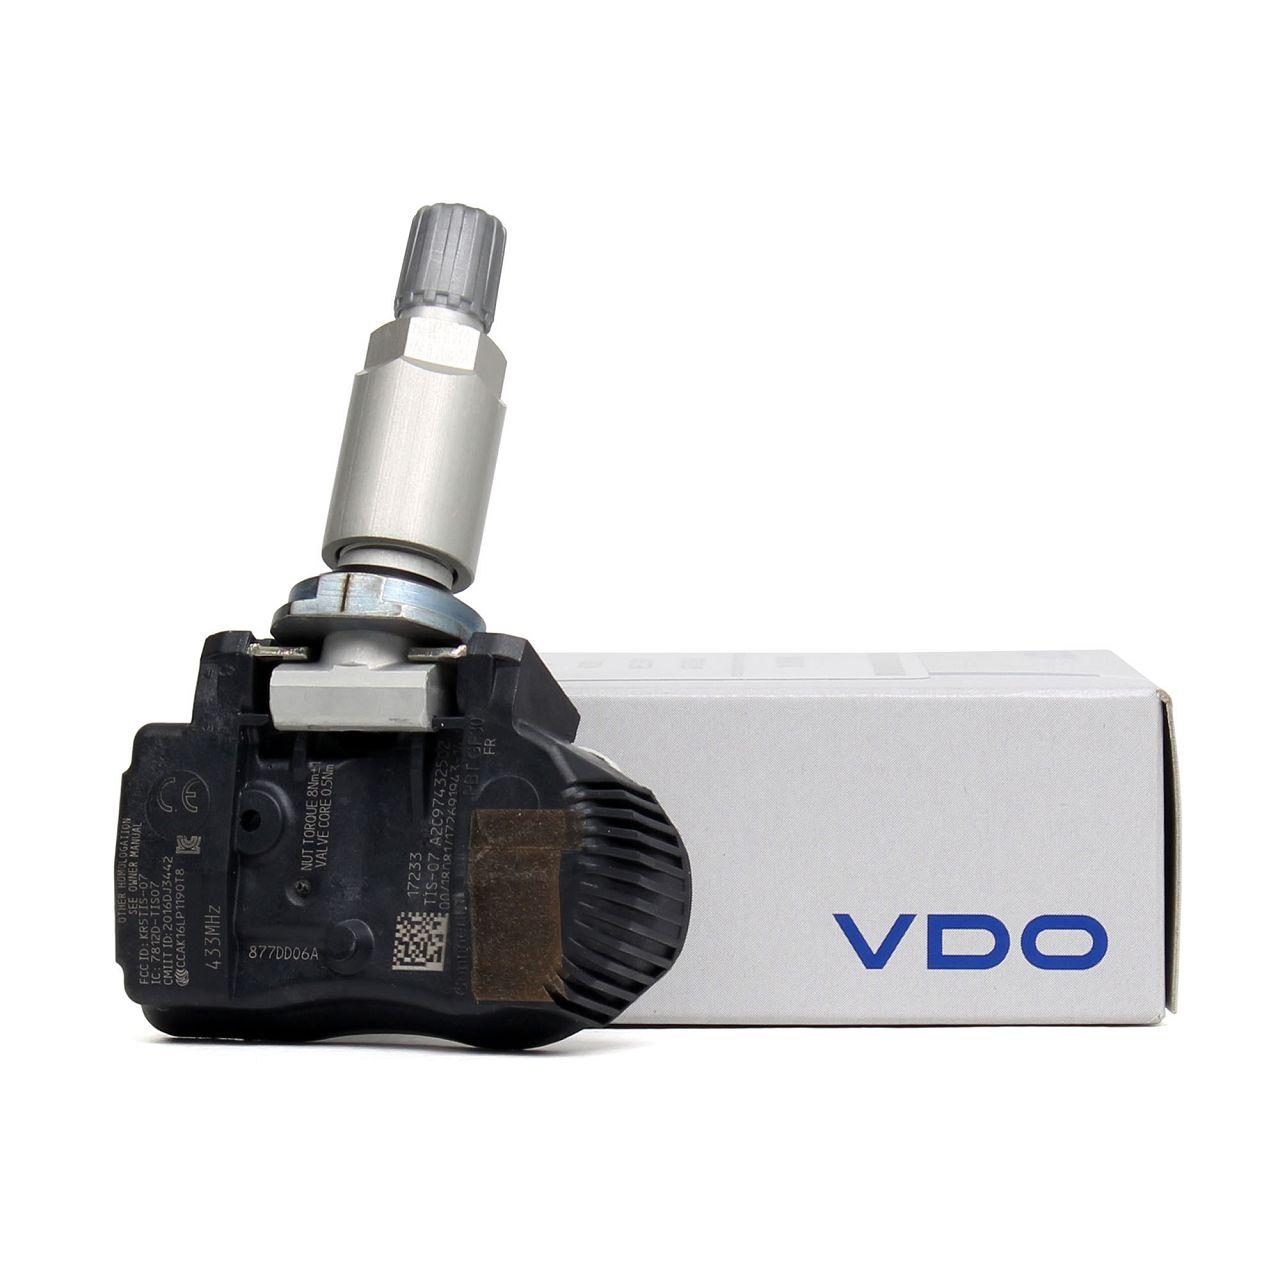 VDO Reifendrucksensor Luftdrucksensor RDKS für BMW F20 F21 F22 F45 F30 F31